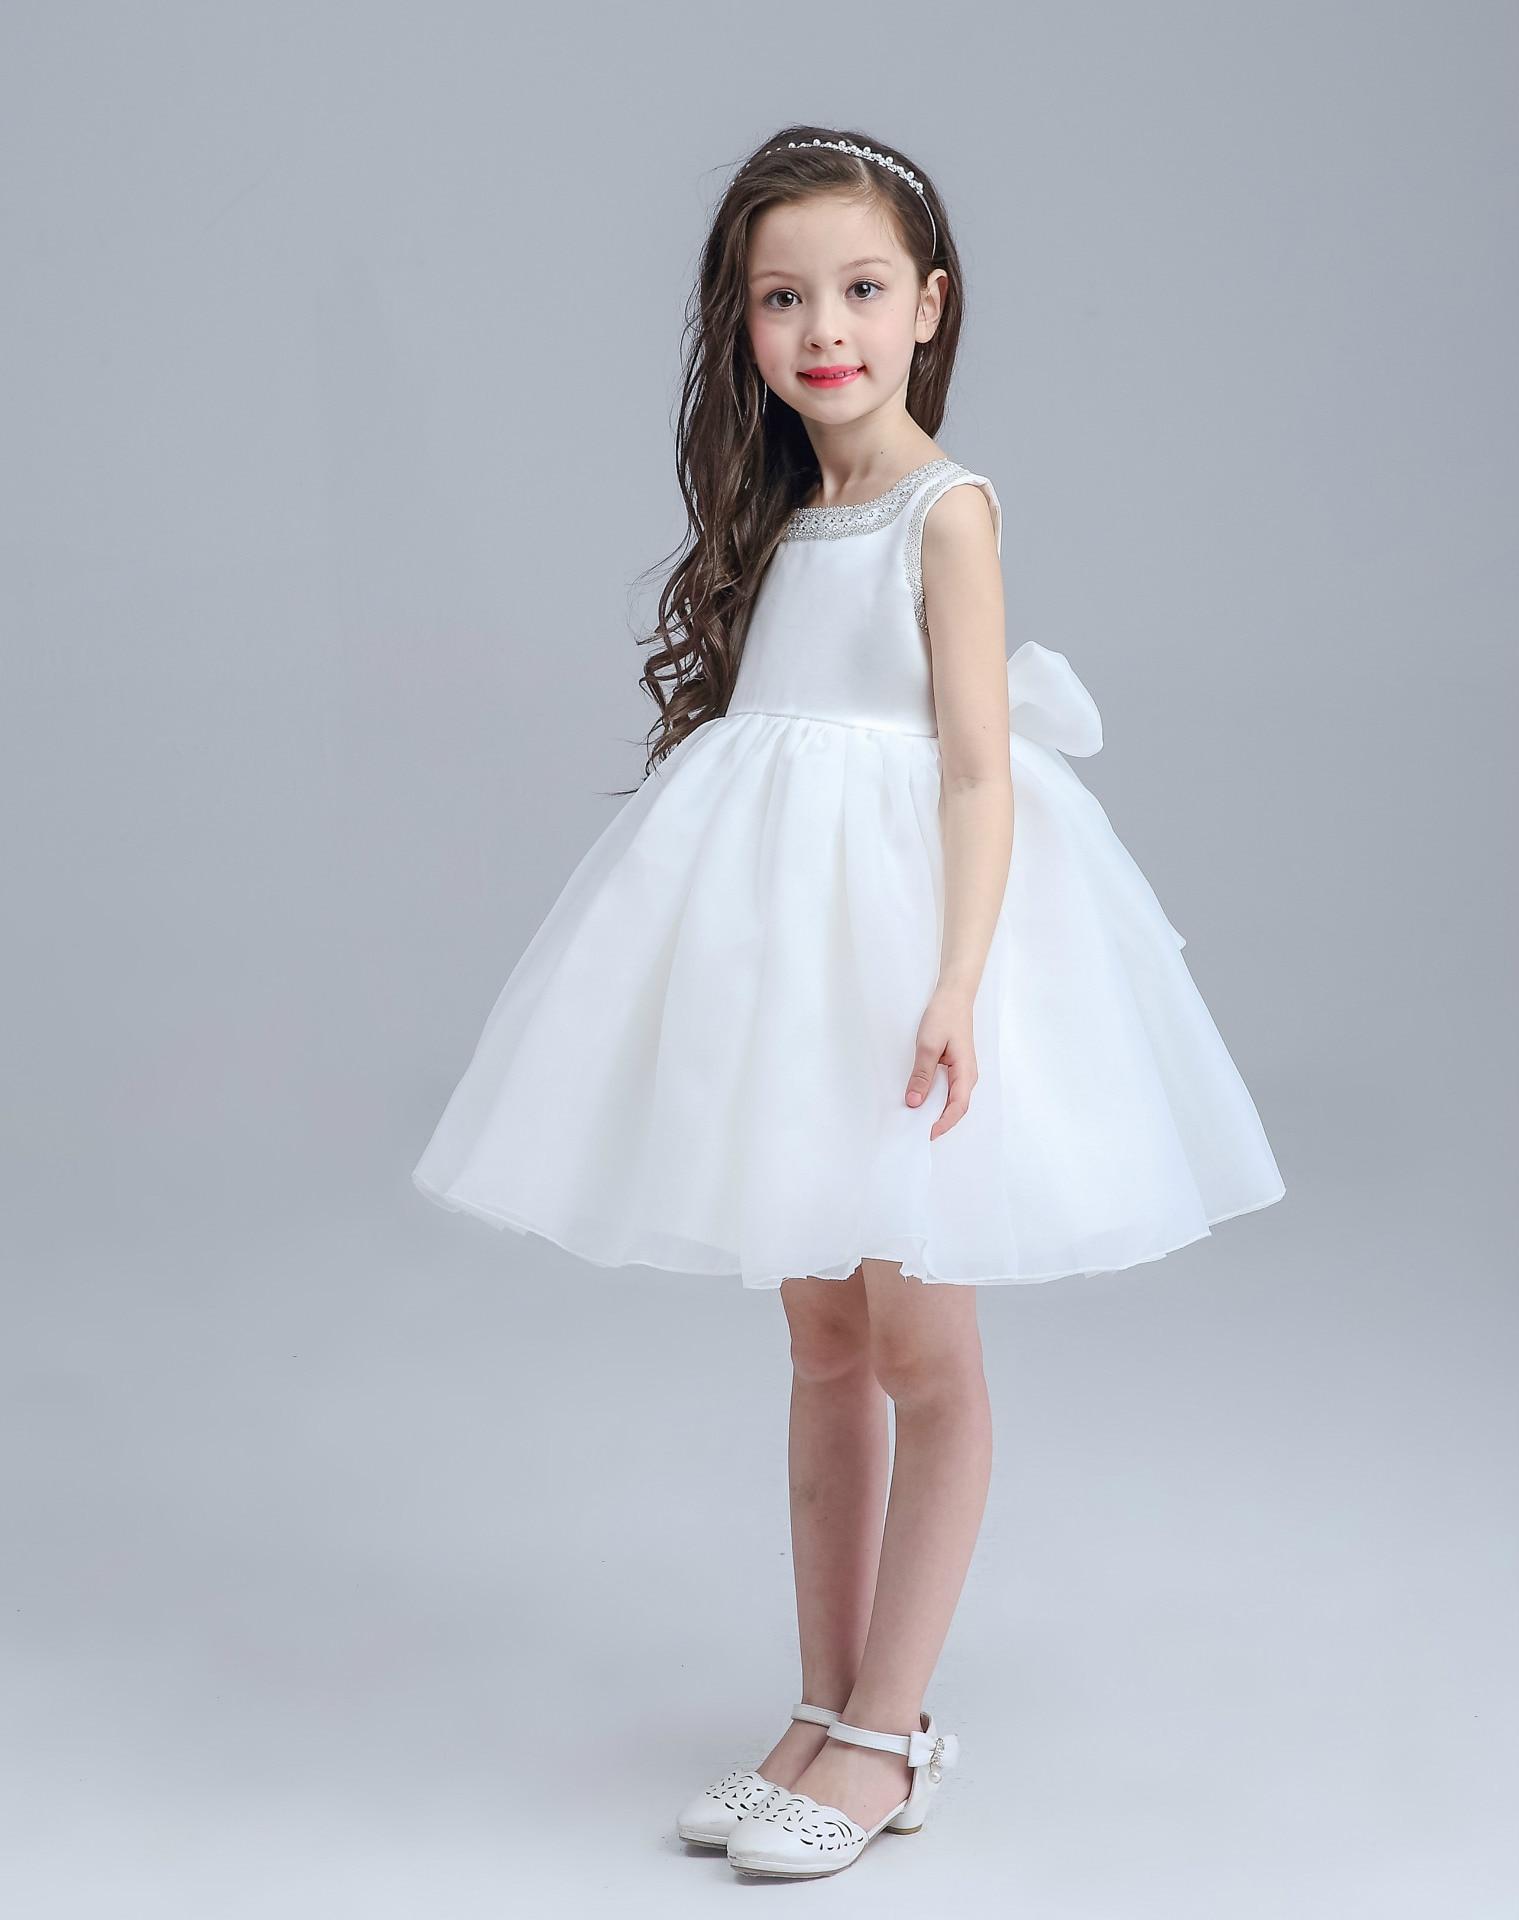 Dorable Girls Wedding Dress Costume Crest - All Wedding Dresses ...